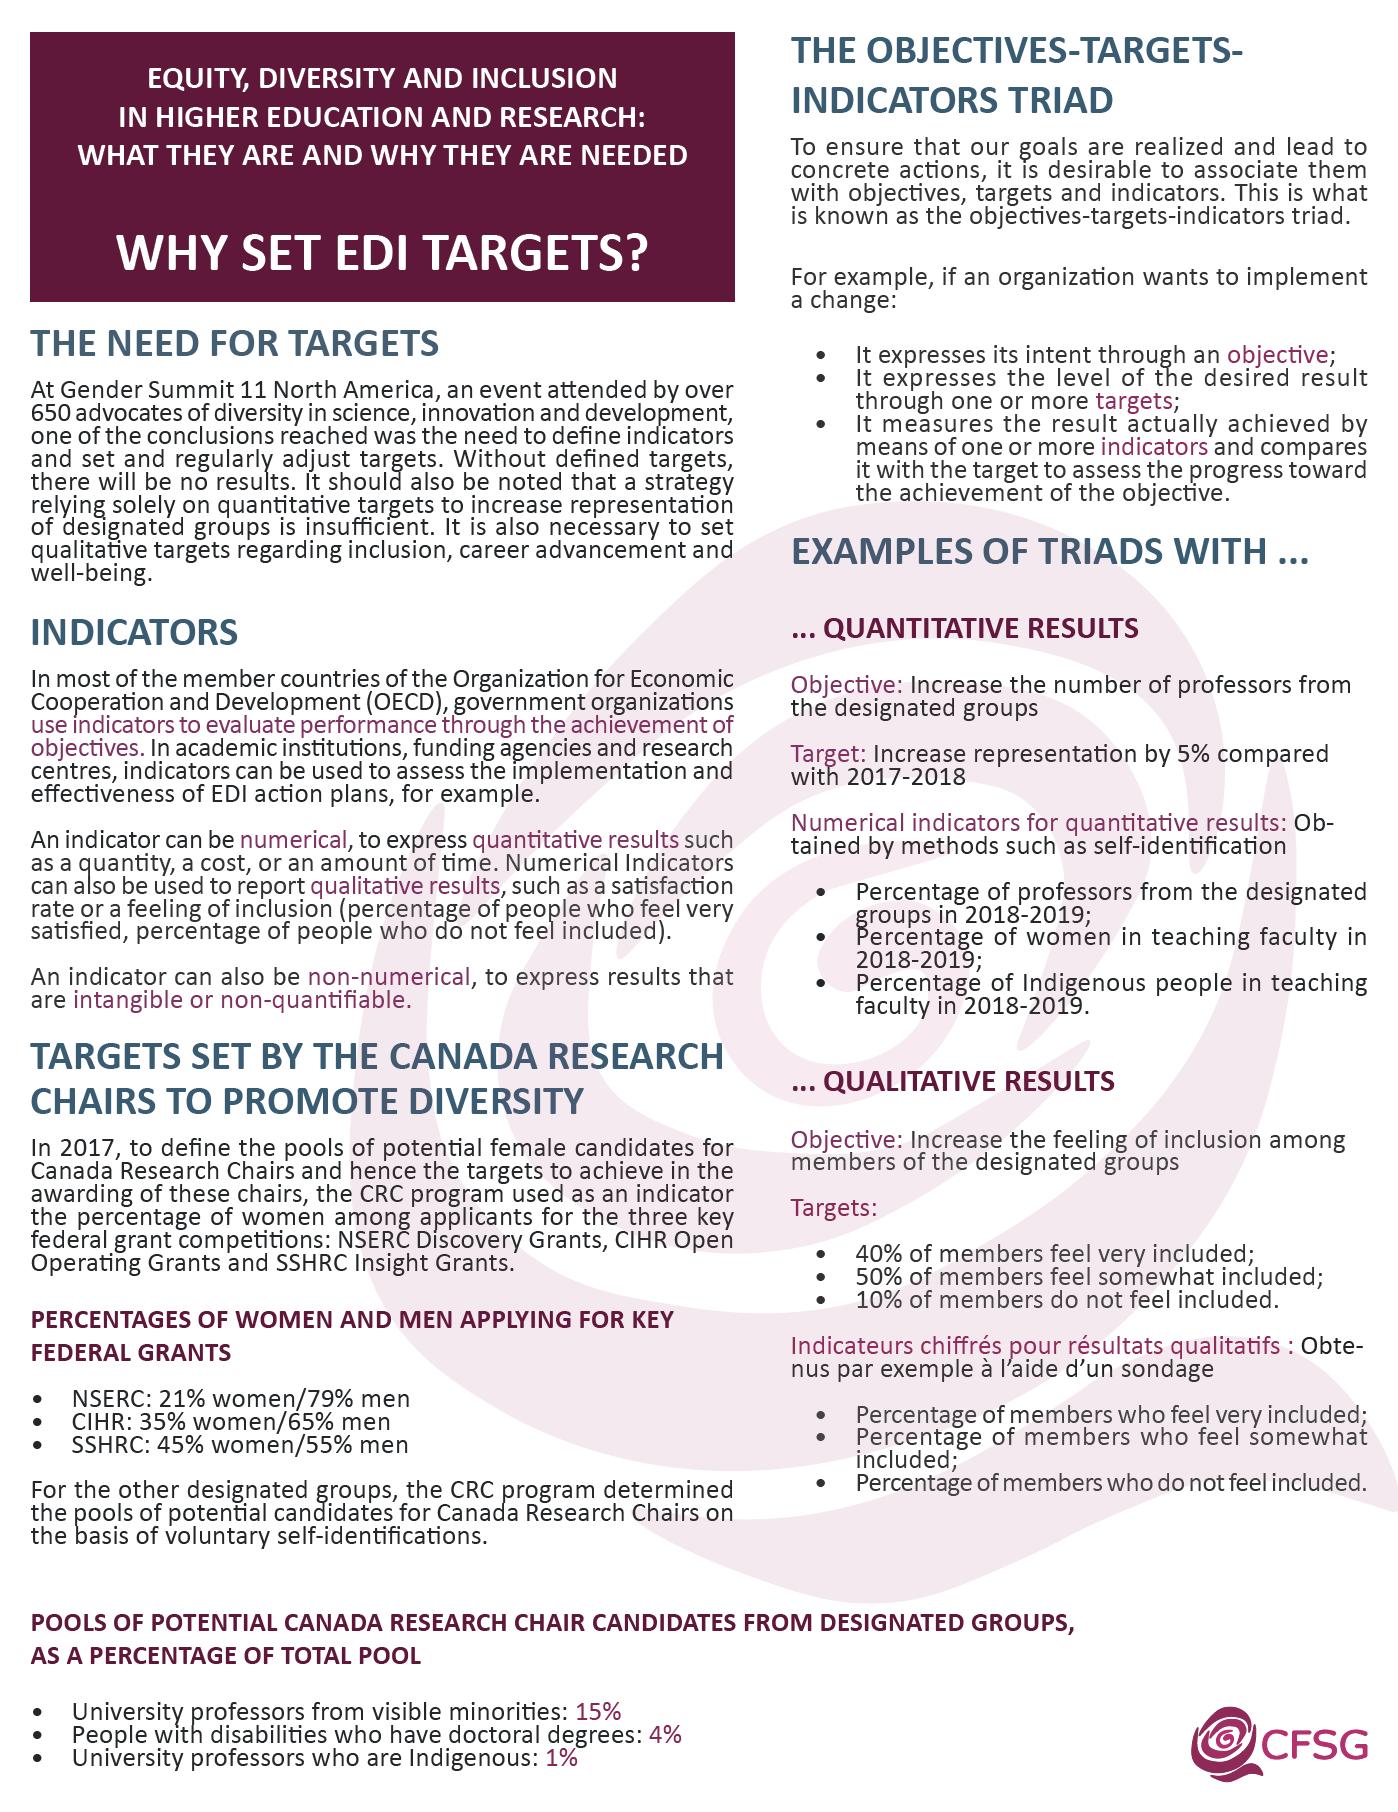 Why Set EDI Targets?